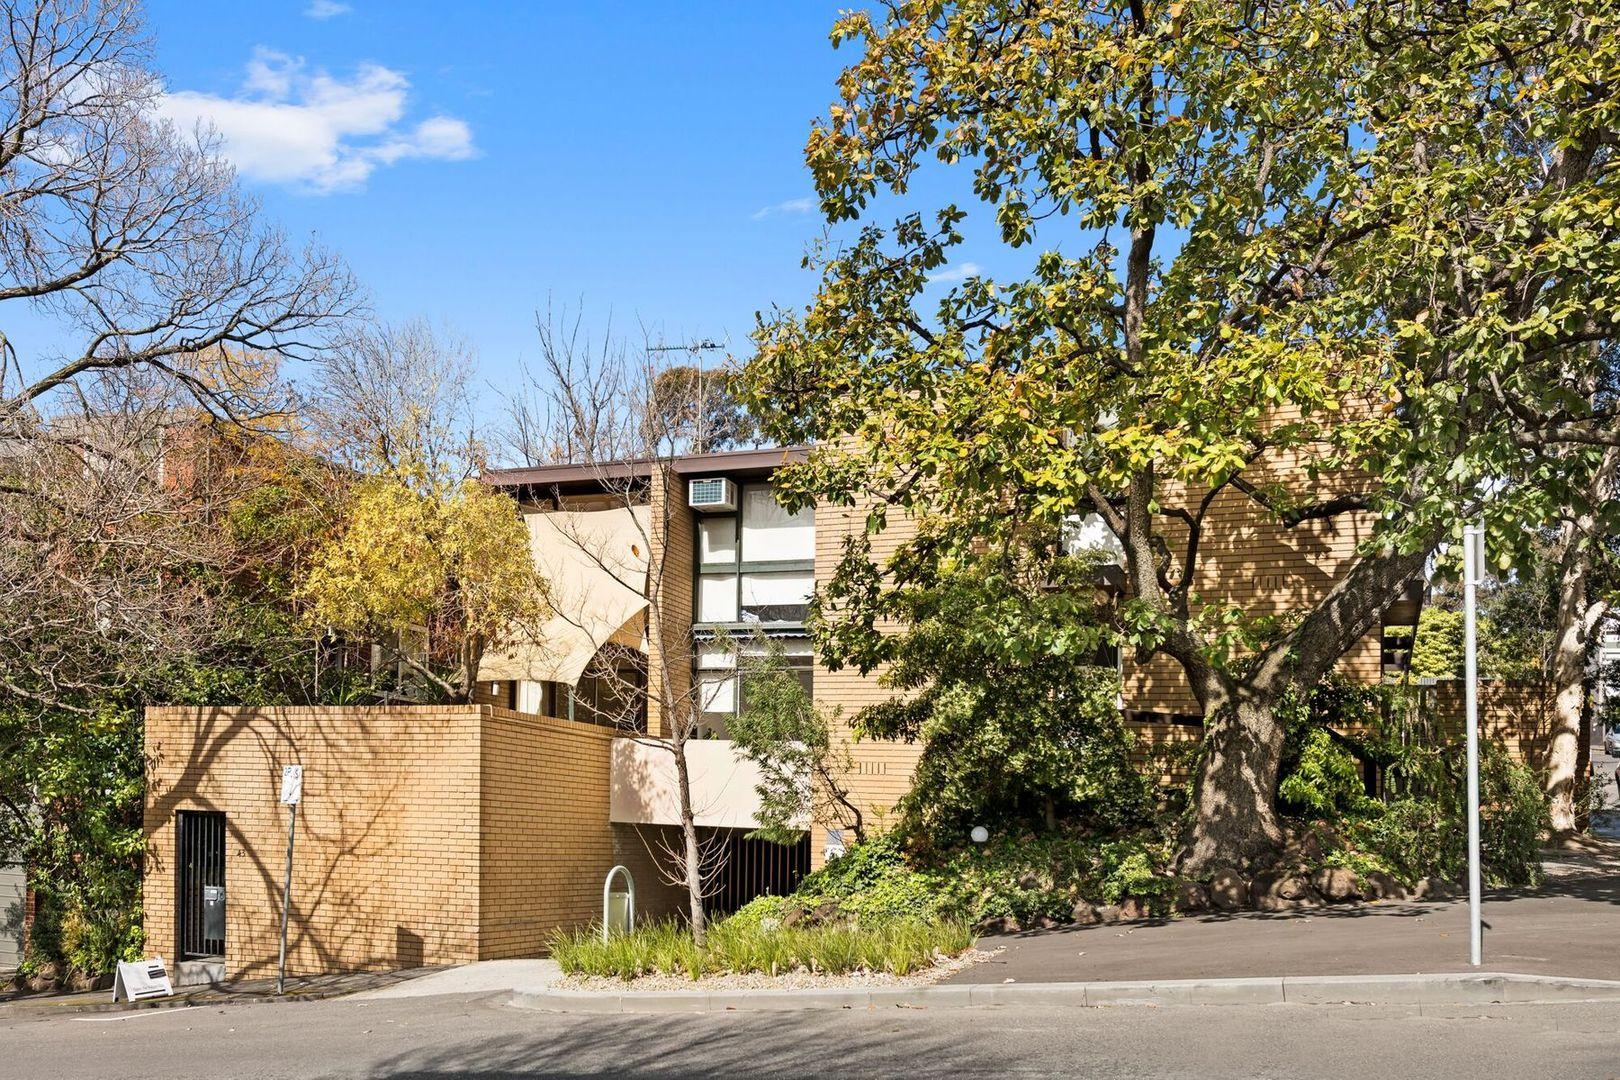 4/43 Clowes Street, South Yarra VIC 3141, Image 0